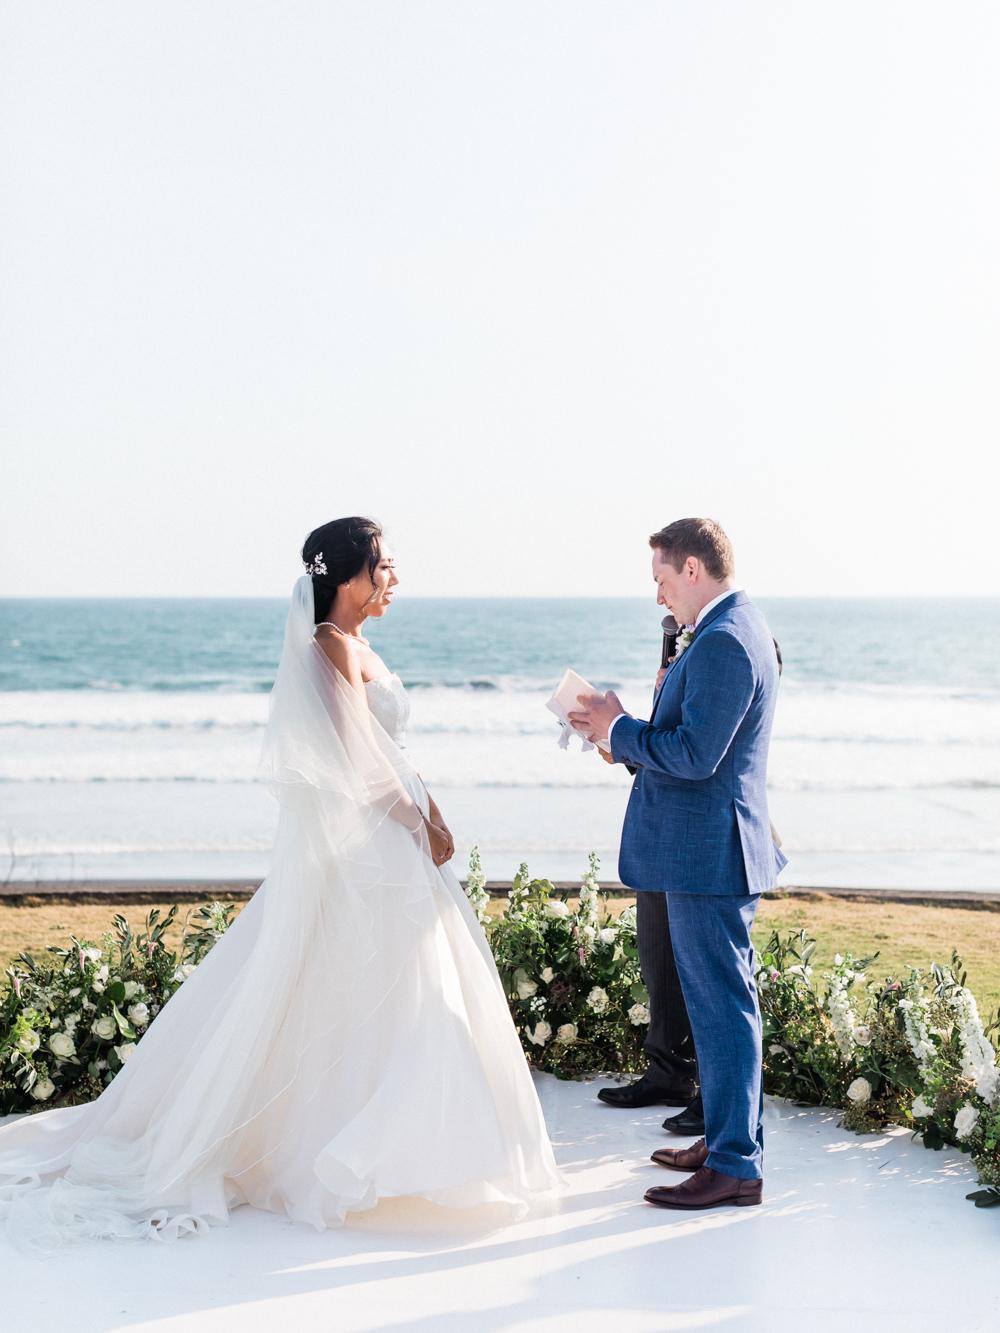 Bali_Real_Wedding_(c)_Rory_Wylie-67.jpg